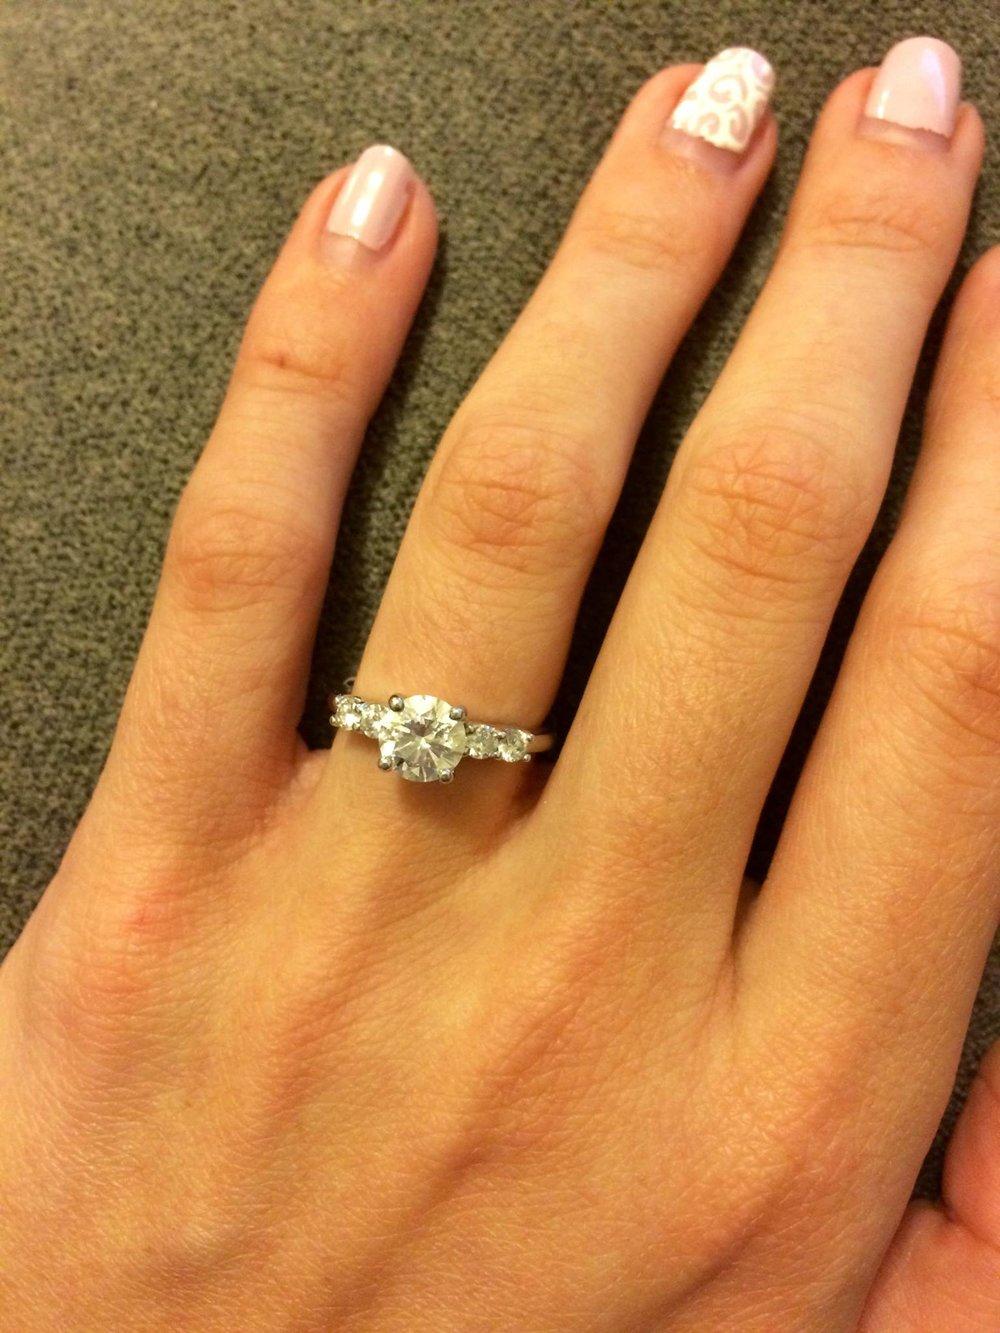 Still loving my beautifully designed custom ring by Norma Wellington. - - M.S.